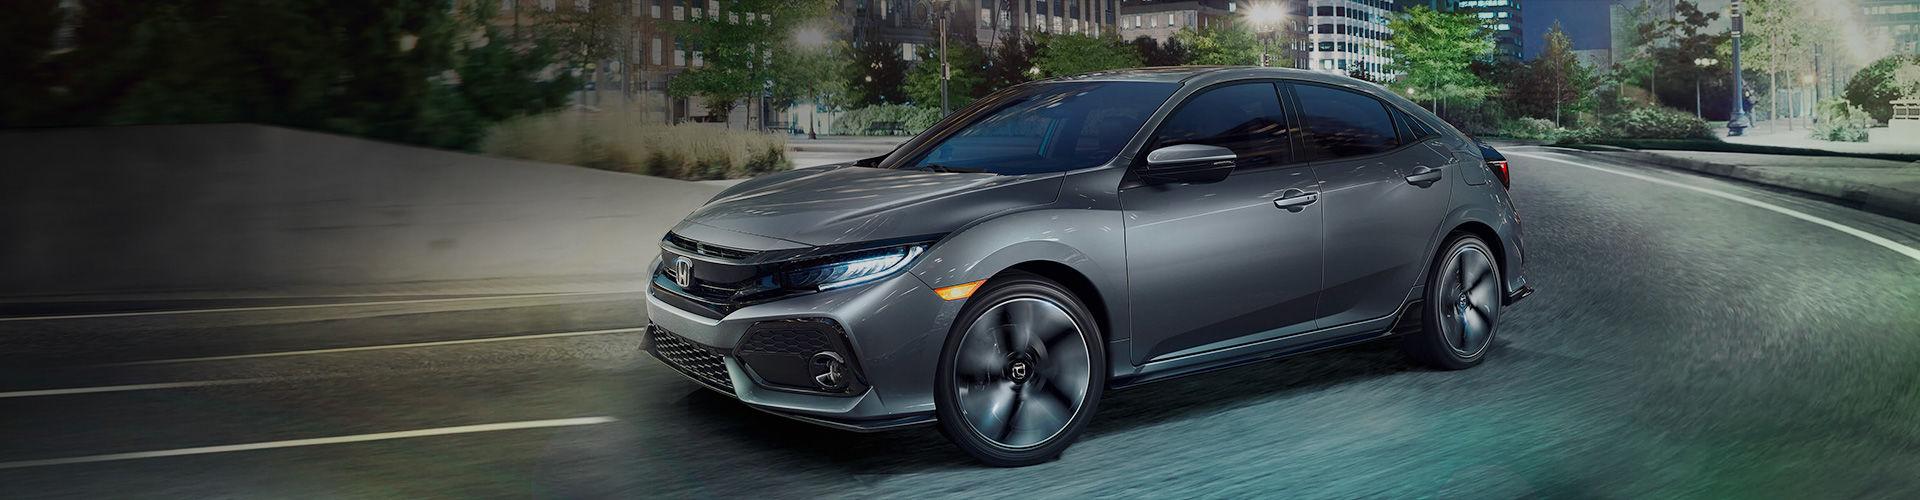 2019 Civic Sedan EX